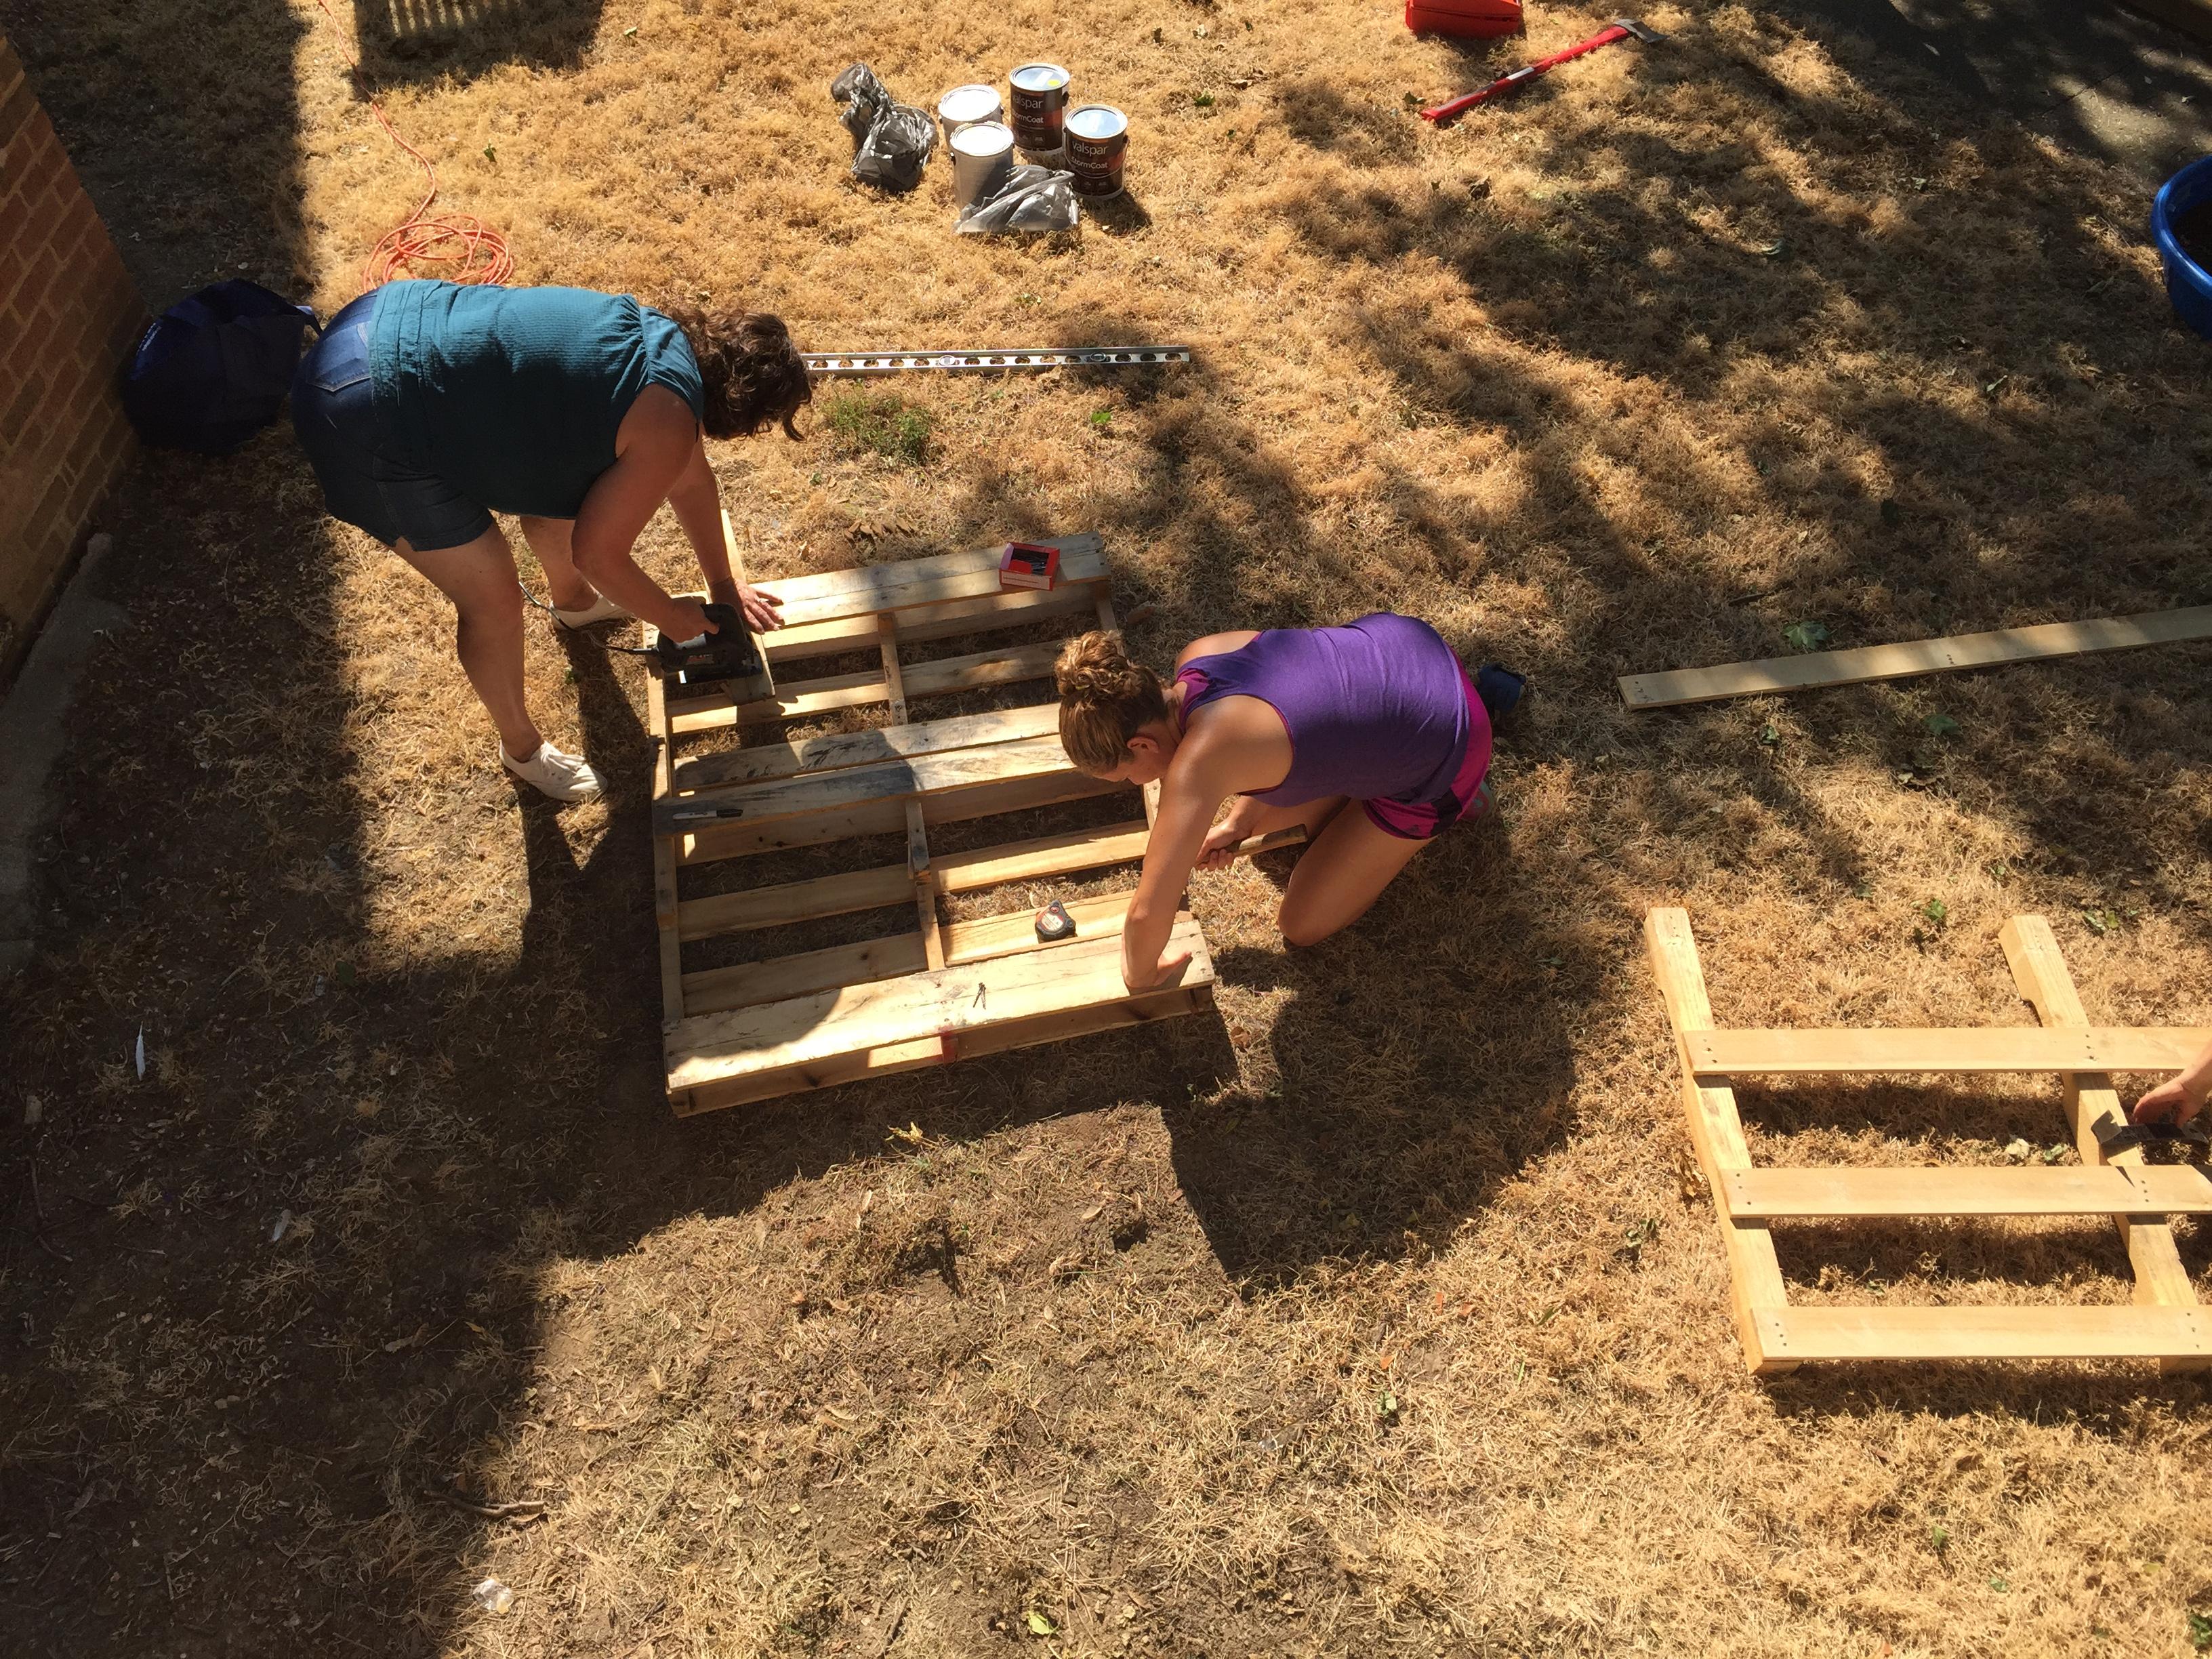 Terri & Beth pallets